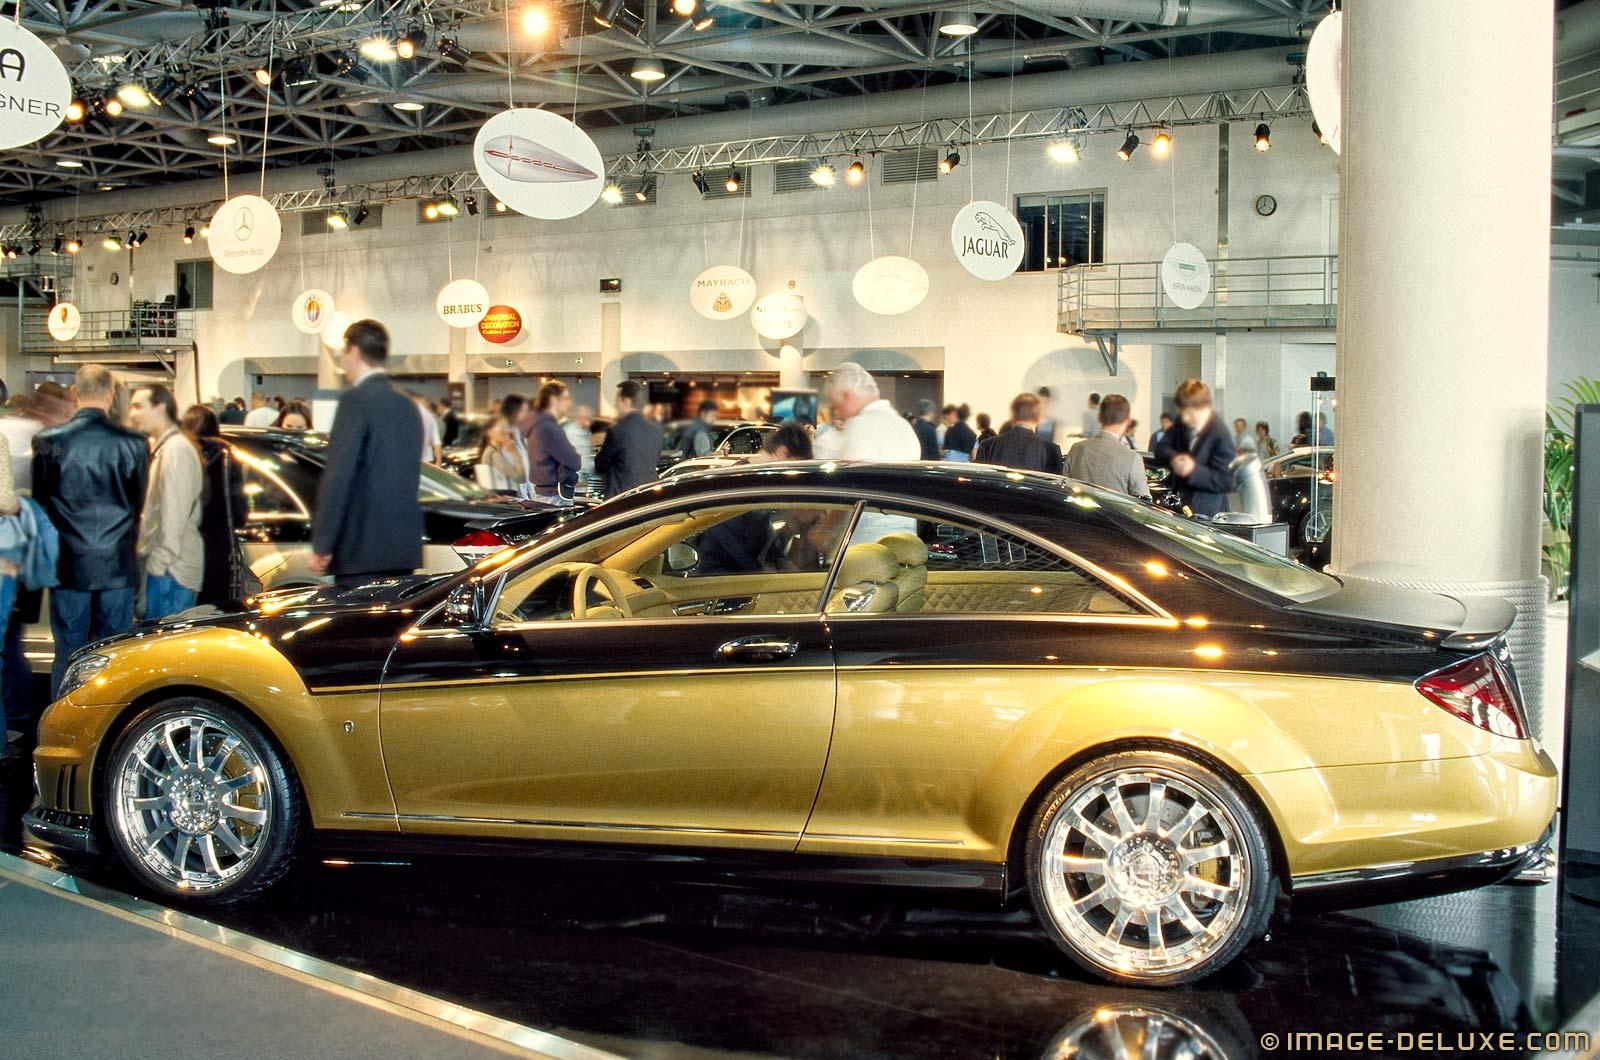 Mercedes benz accessories mercedes benz for Mercedes benz s550 parts and accessories